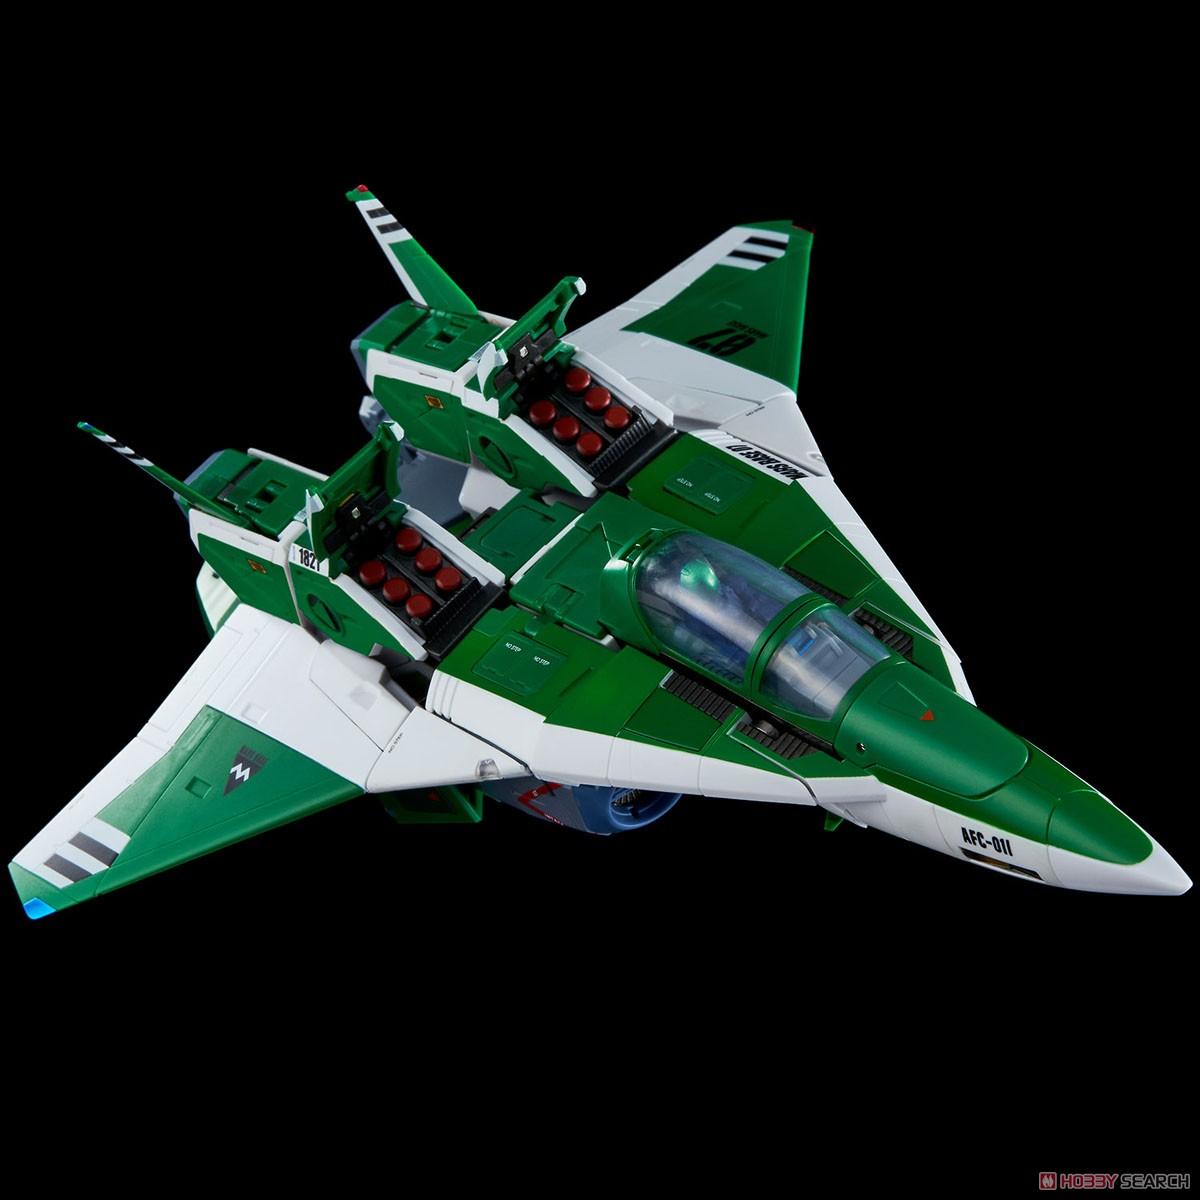 RIOBOT『AFC-01I レギオス・イオタ』機甲創世記モスピーダ 1/48 可変可動フィギュア-010